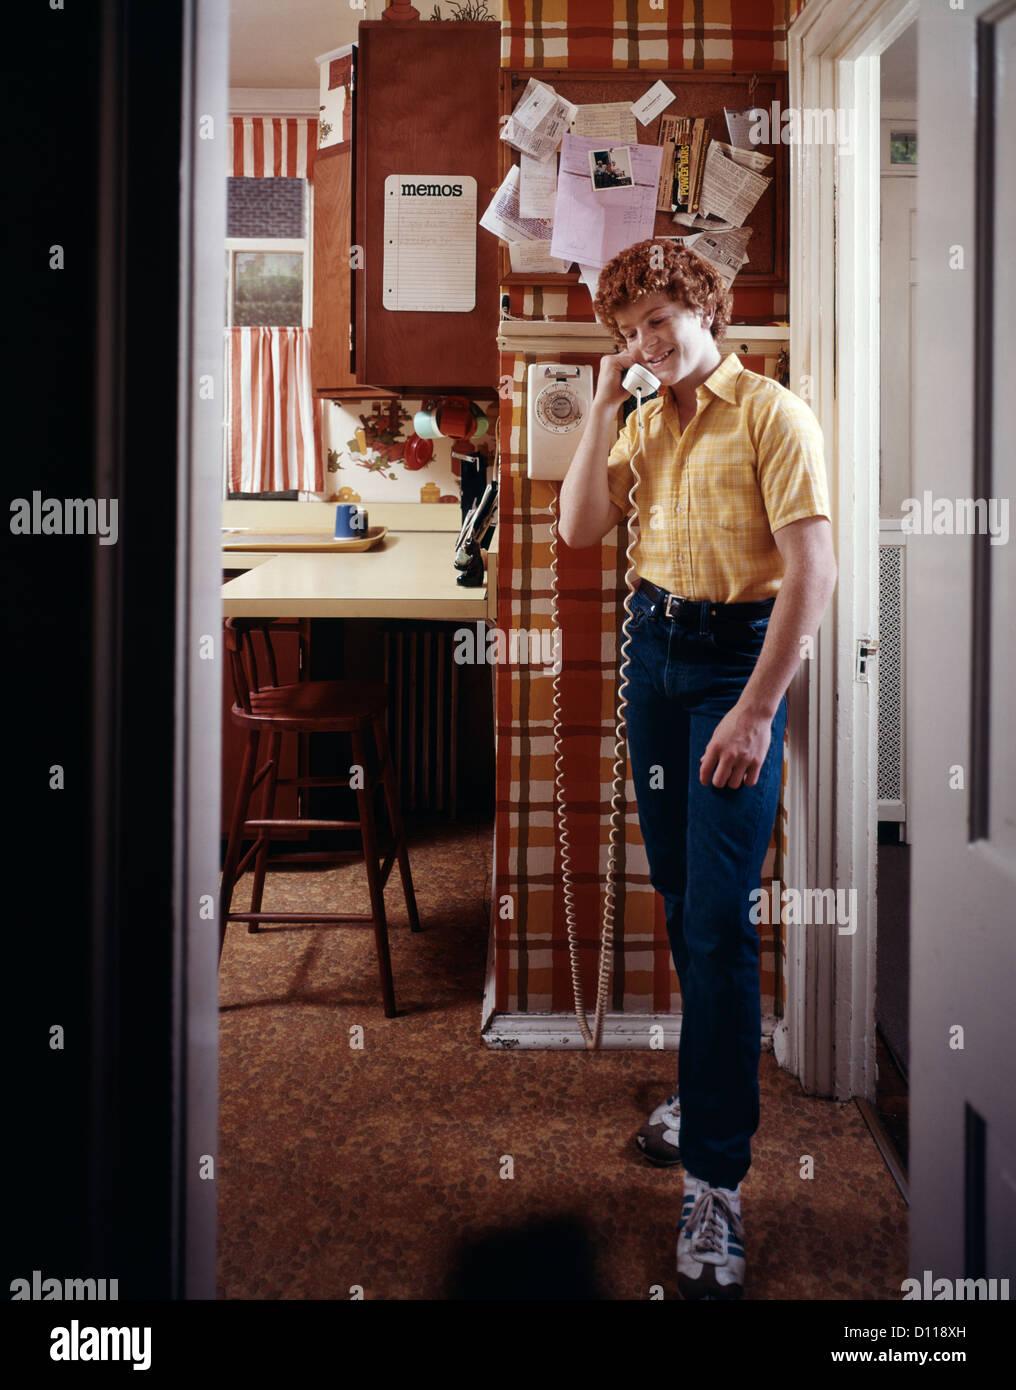 1970s TEENAGE BOY TALKING ON KITCHEN WALL PHONE TELEPHONE